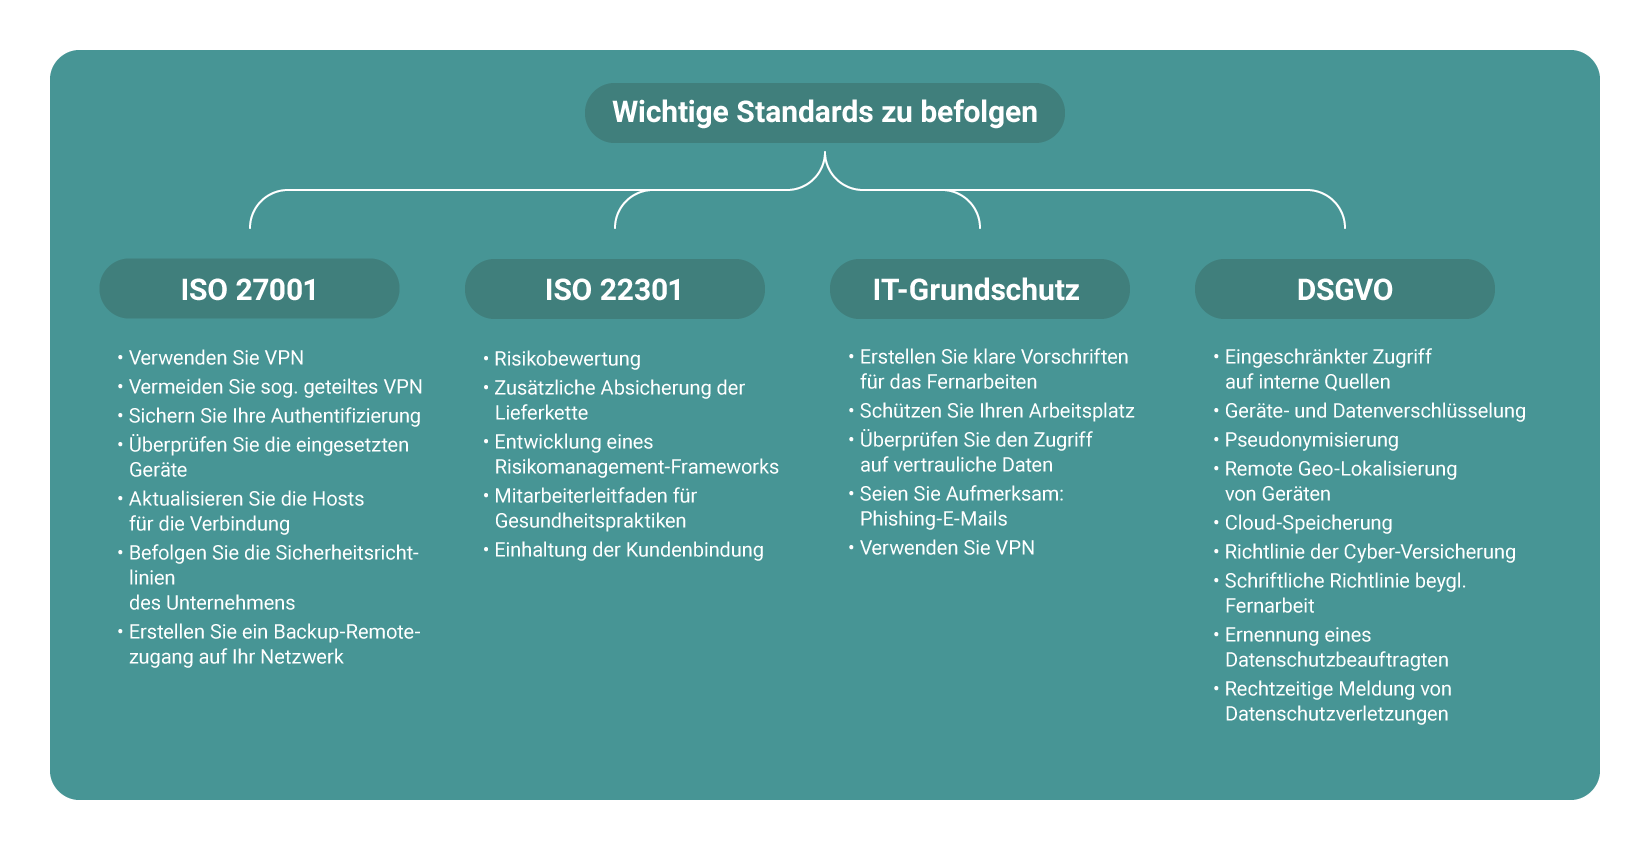 ISO 27001 ISO 22301 IT-Grunschutz 2020 DSGVO COVID-Pandemie